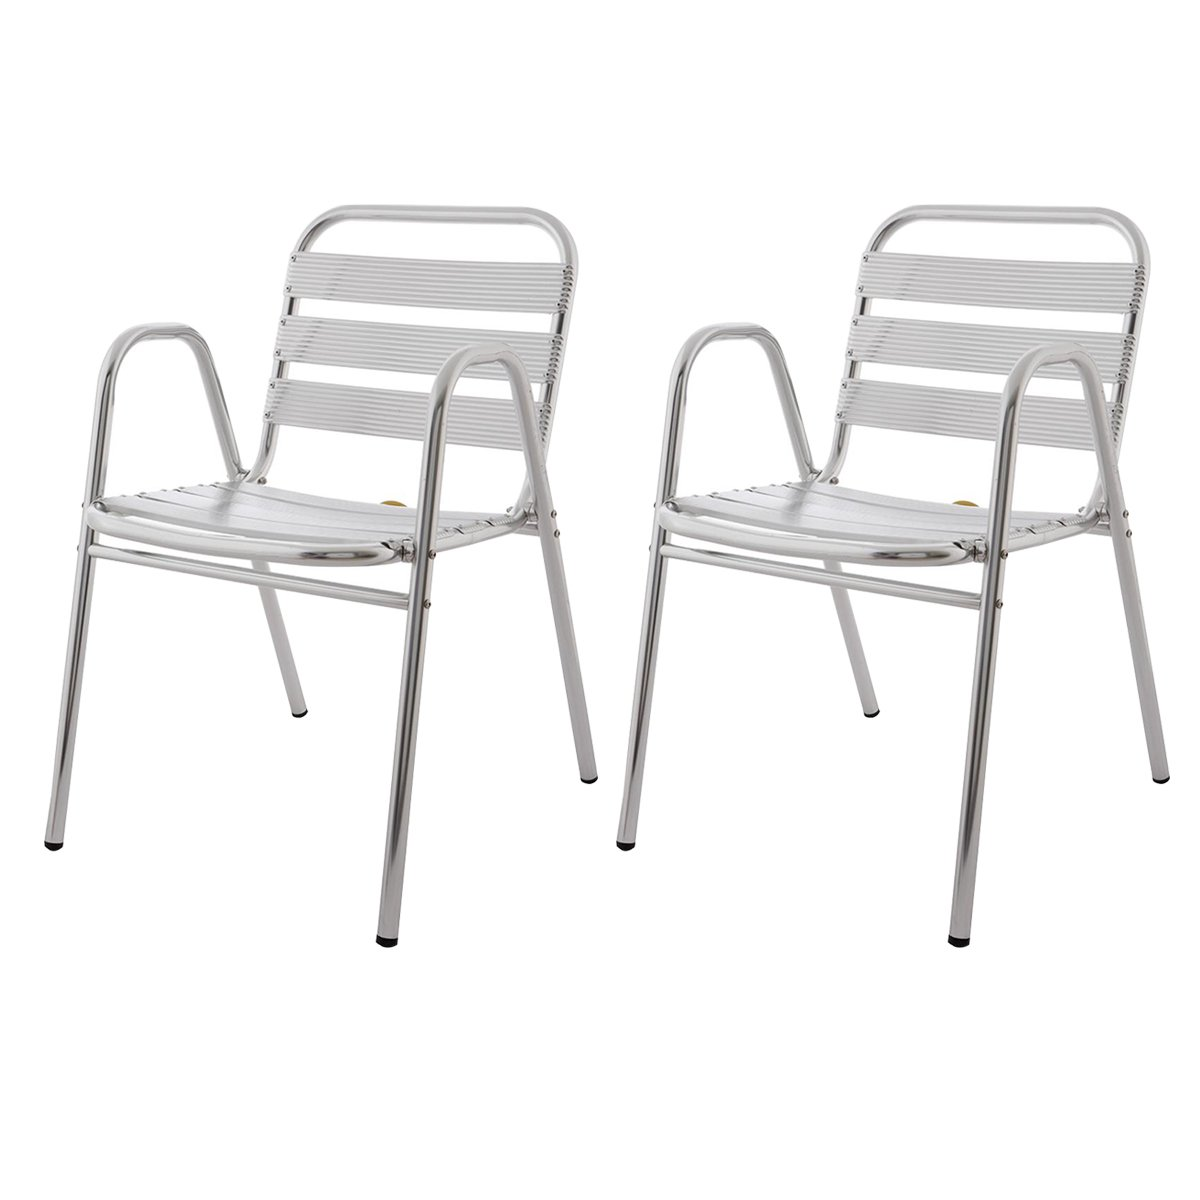 2x Gartenstühle alu AOSTE - Bistro-Stühle alu - Terrassenstühle - Farbe: Aluminium